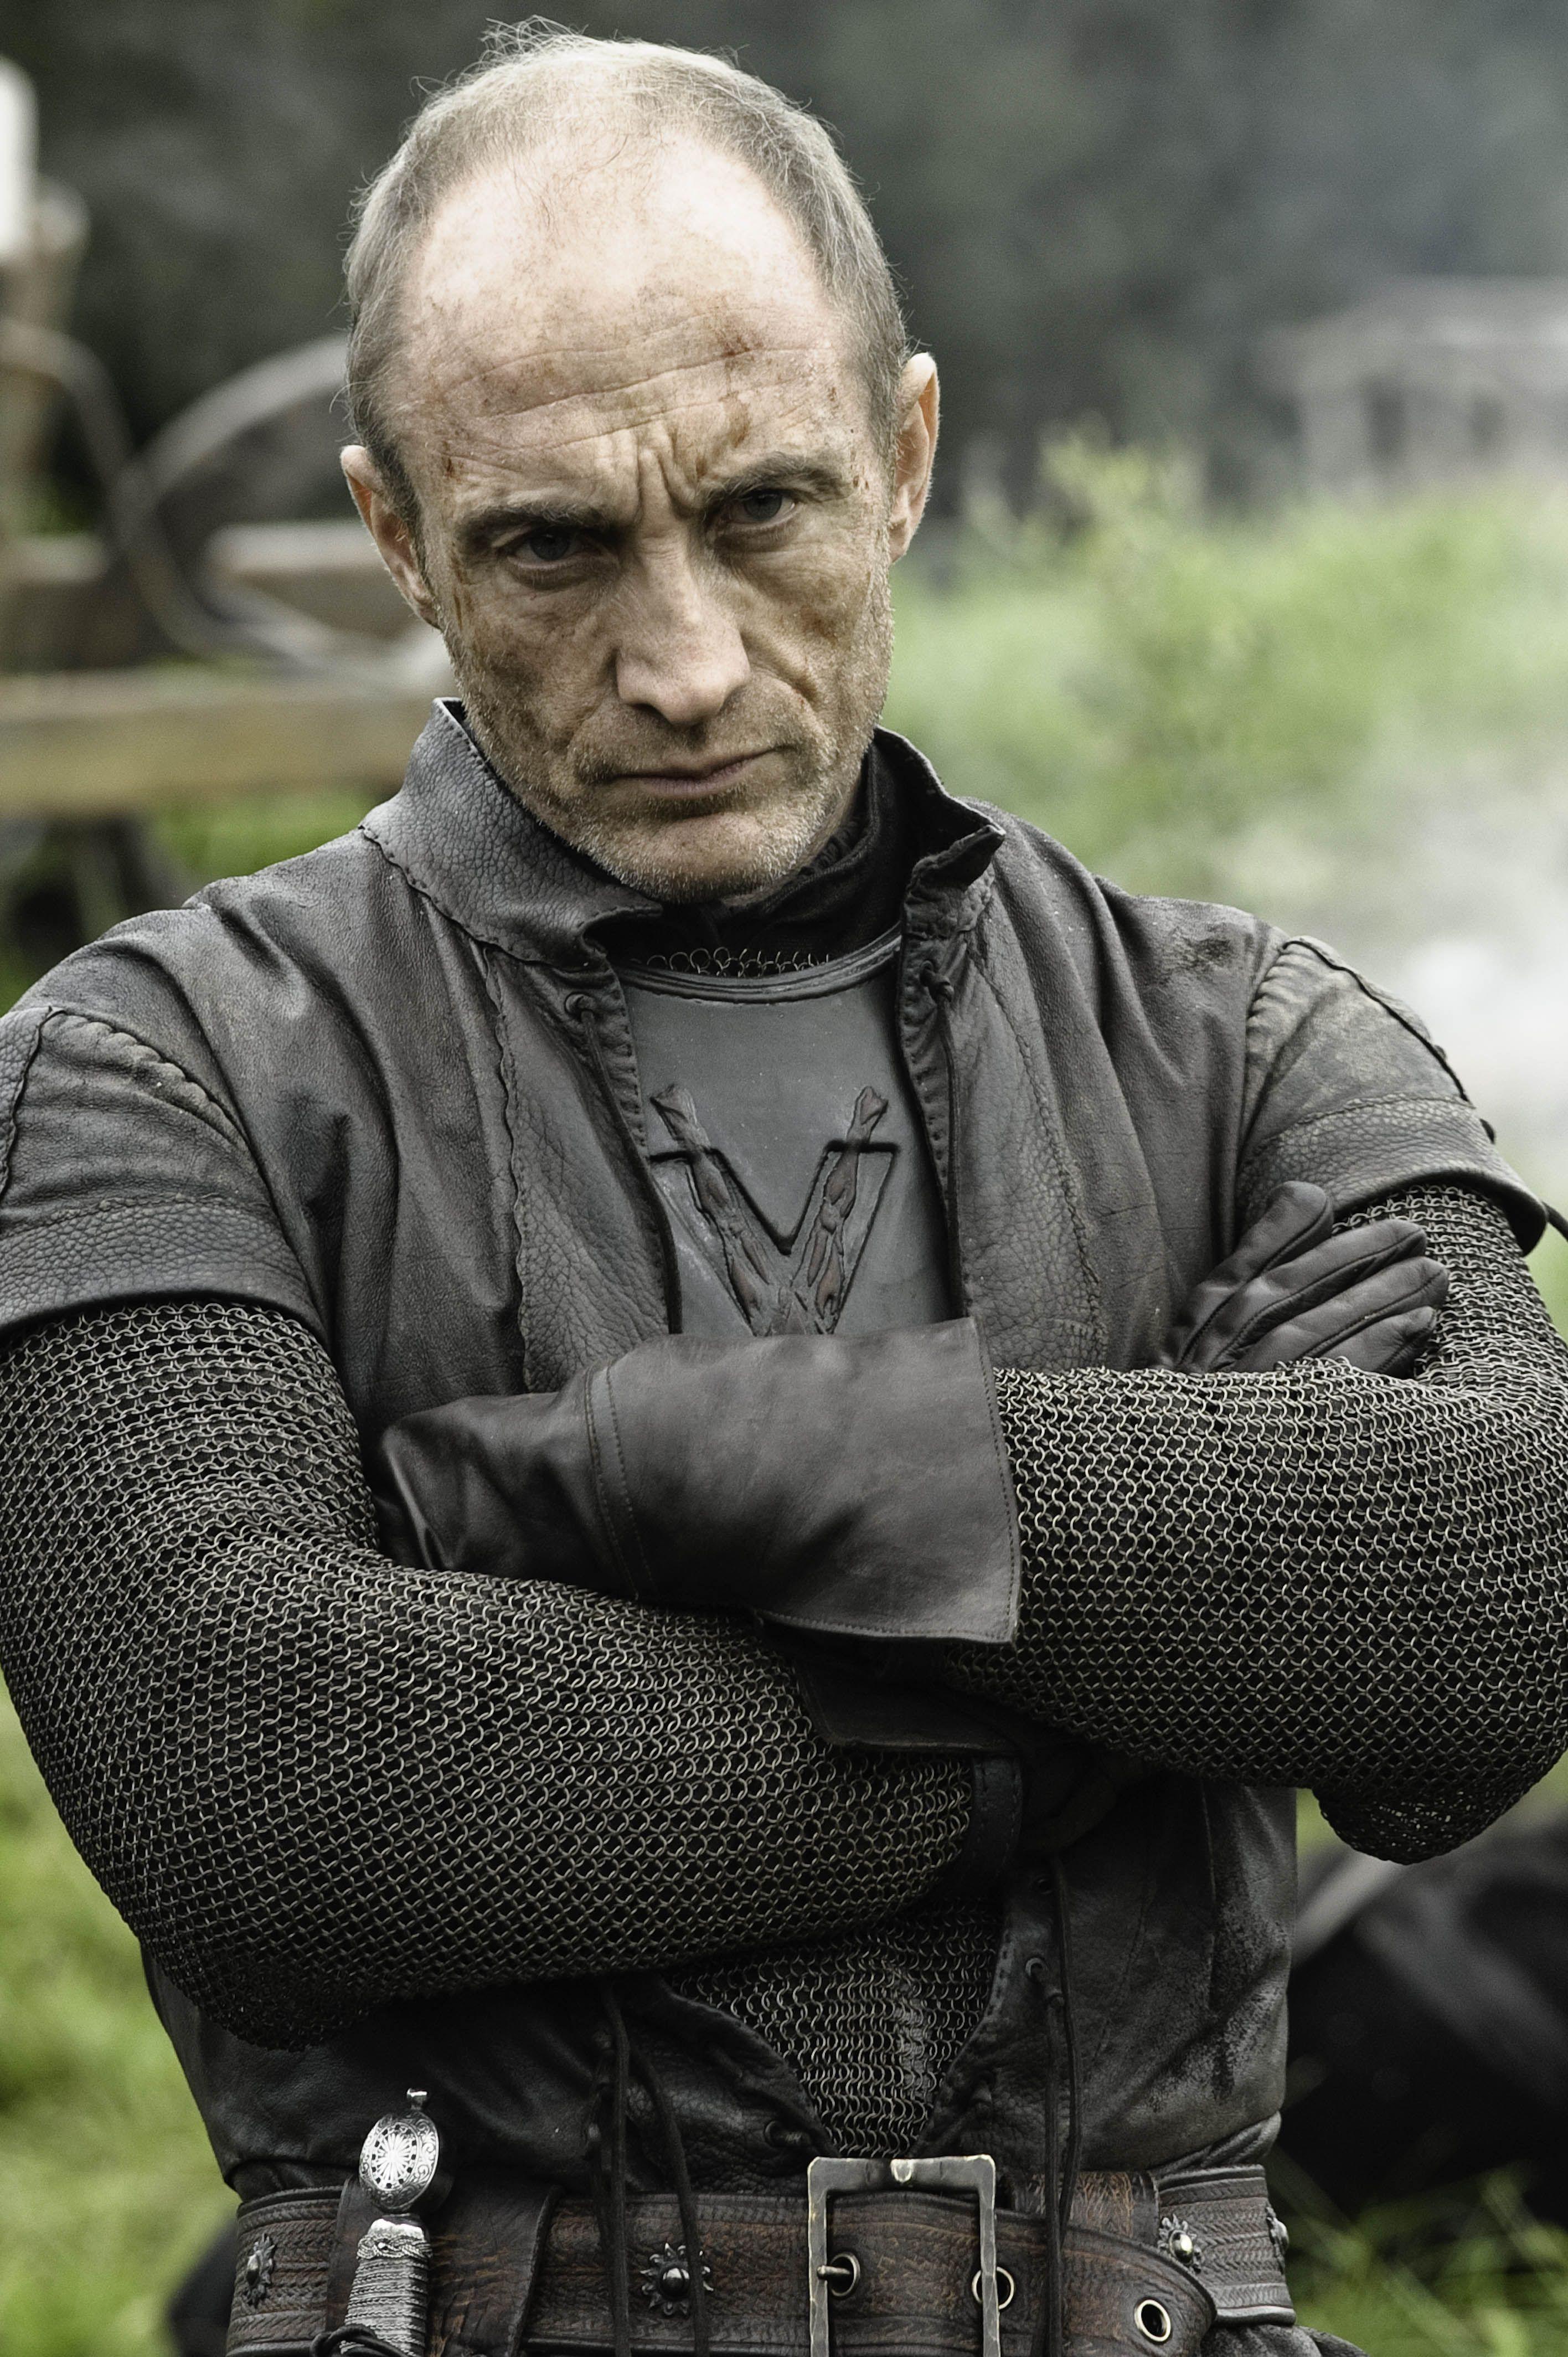 Game of Thrones - Season 2 Episode 4 Still